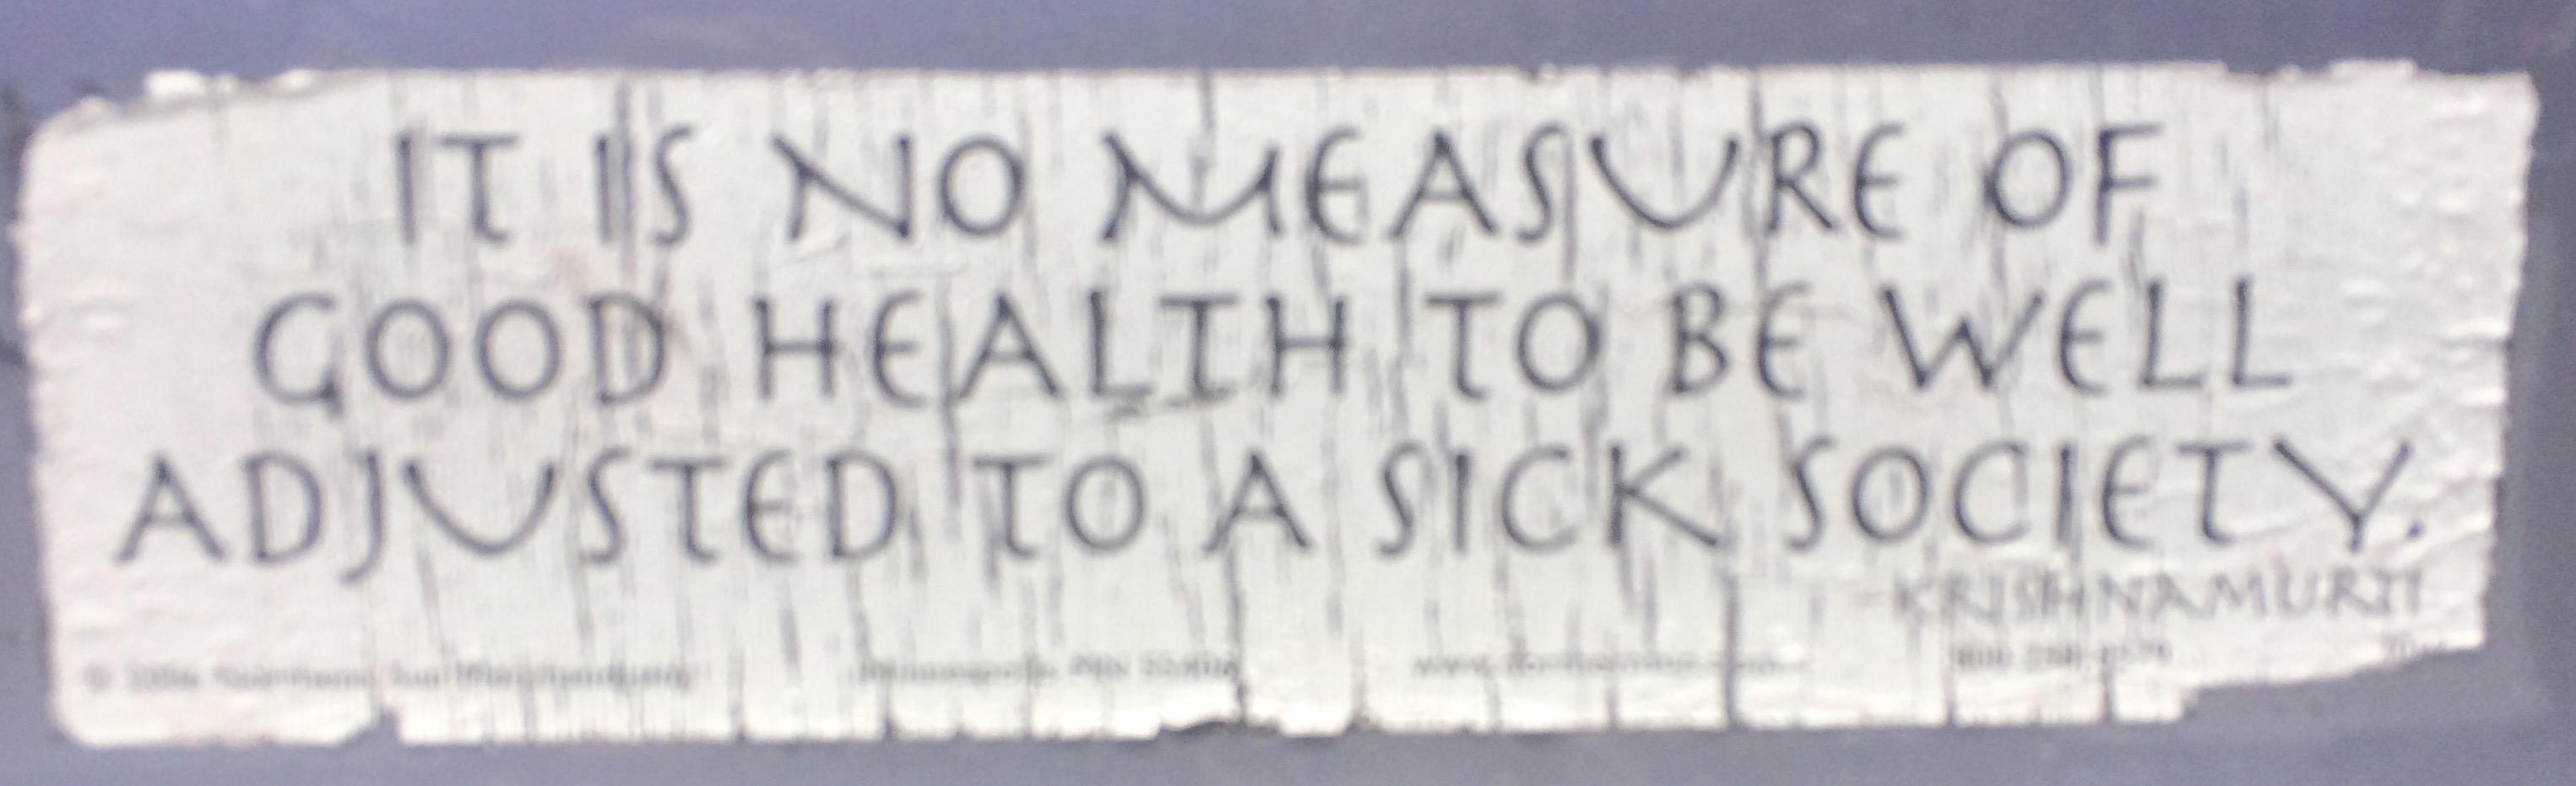 Bumper Sticker Sick Society